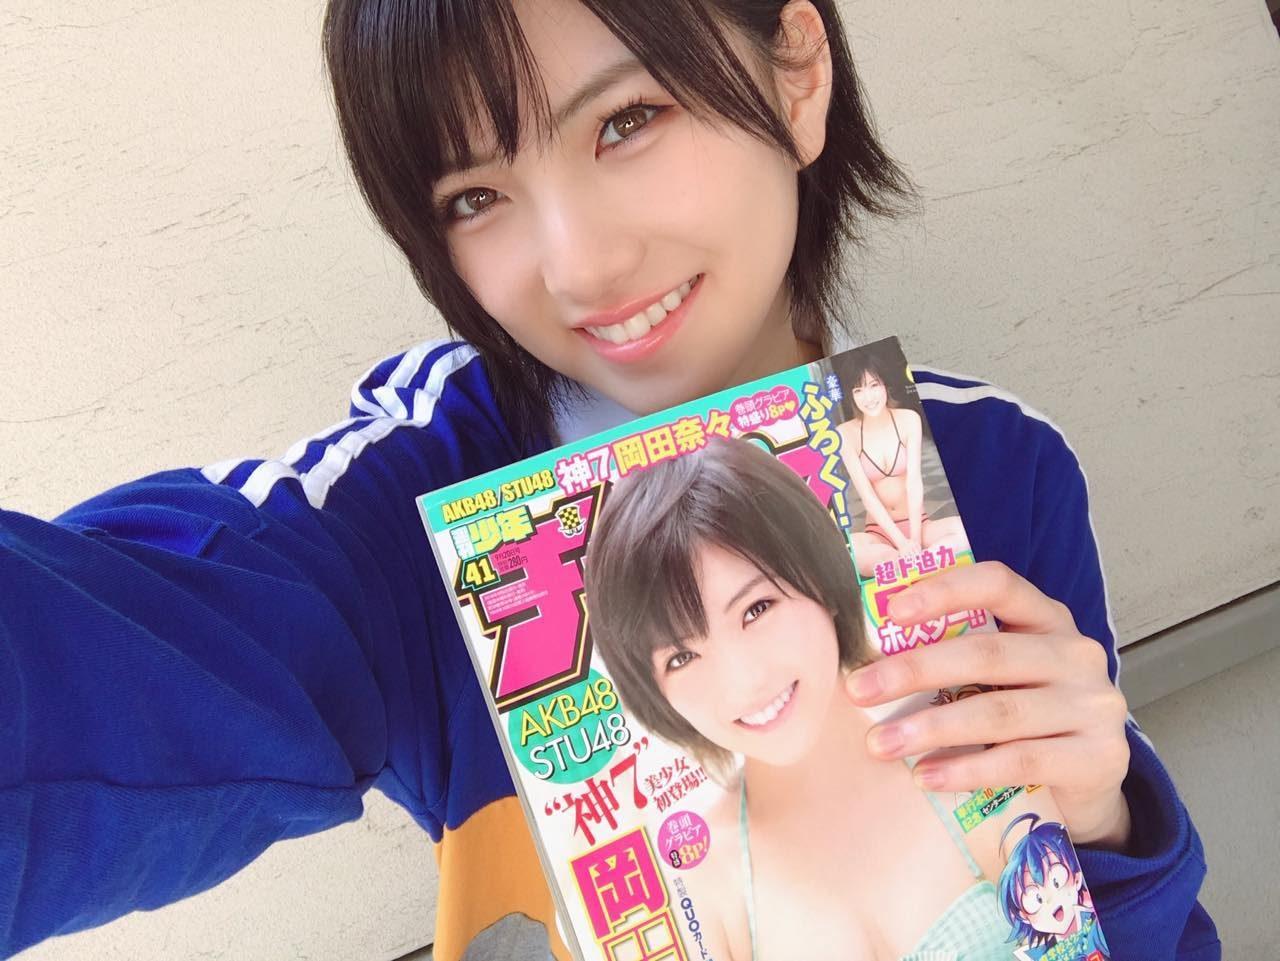 AKB48岡田奈々「週刊少年チャンピオン 2018年 No.41」表紙&巻頭グラビア! [9/6発売]